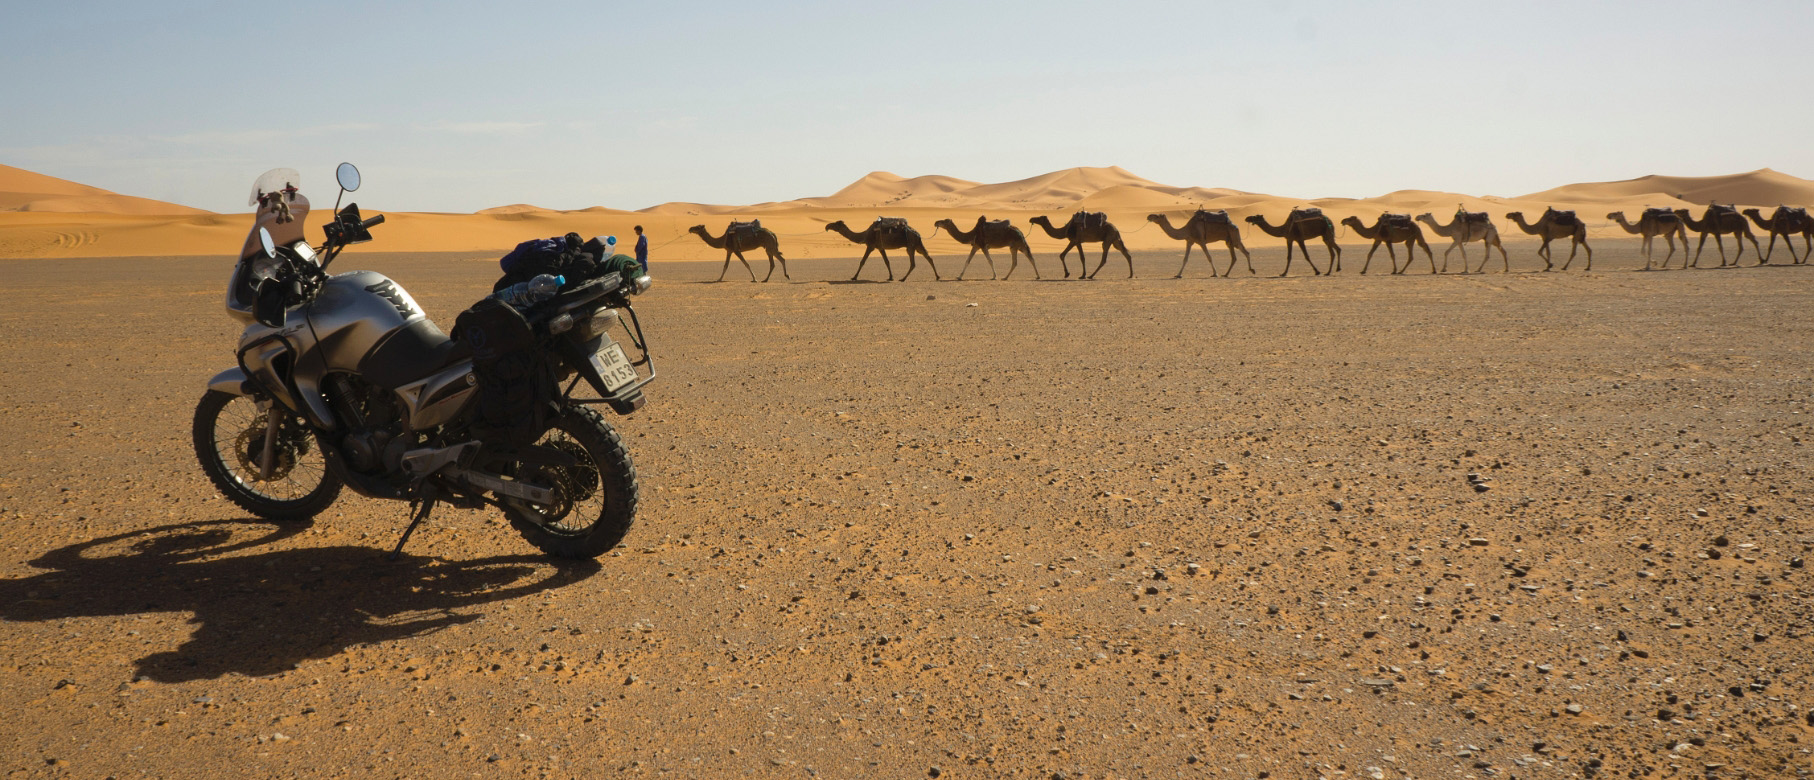 DIVING, MOTORBIKES & 4X4